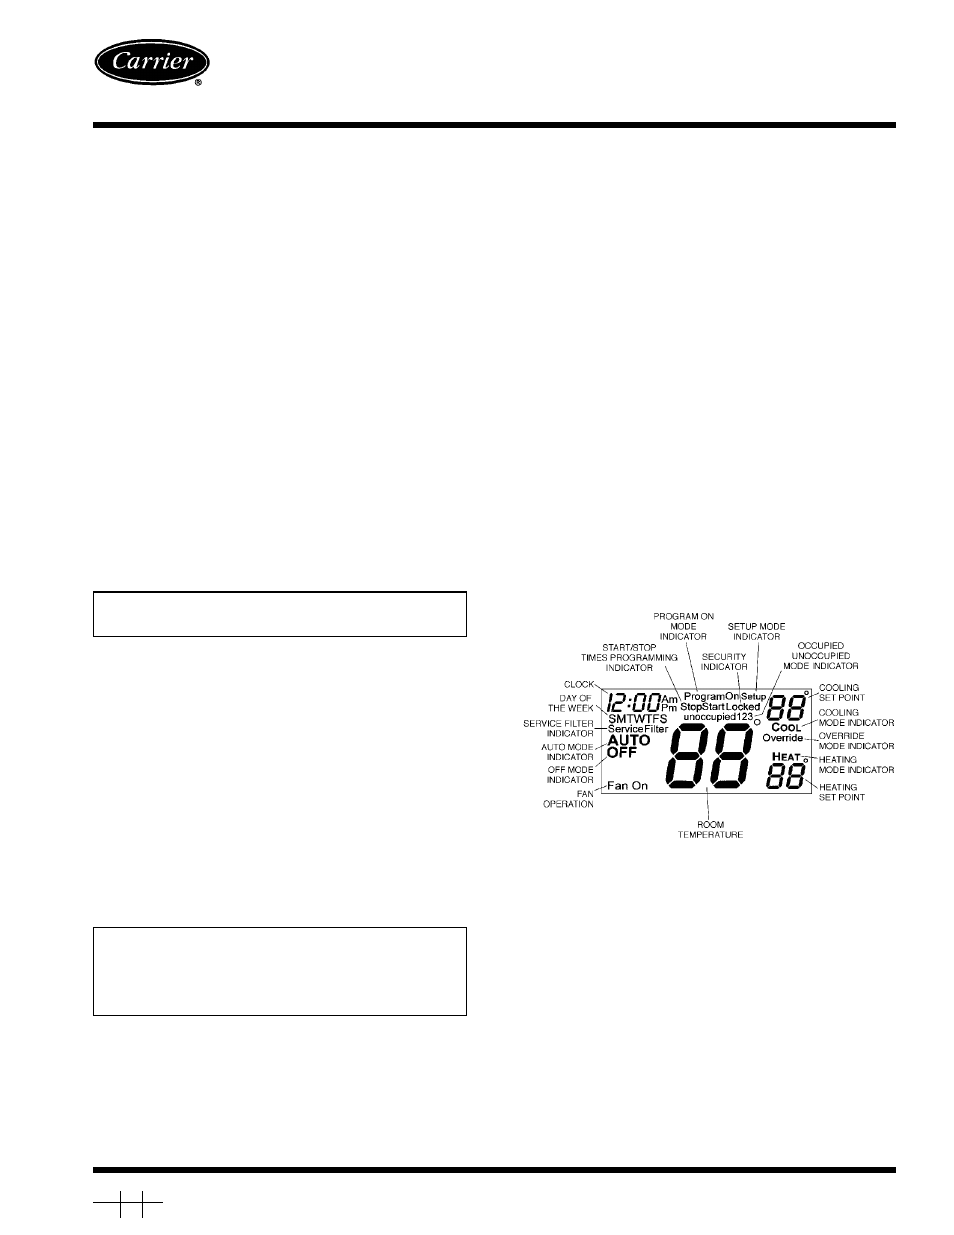 Carrier 33CS User Manual